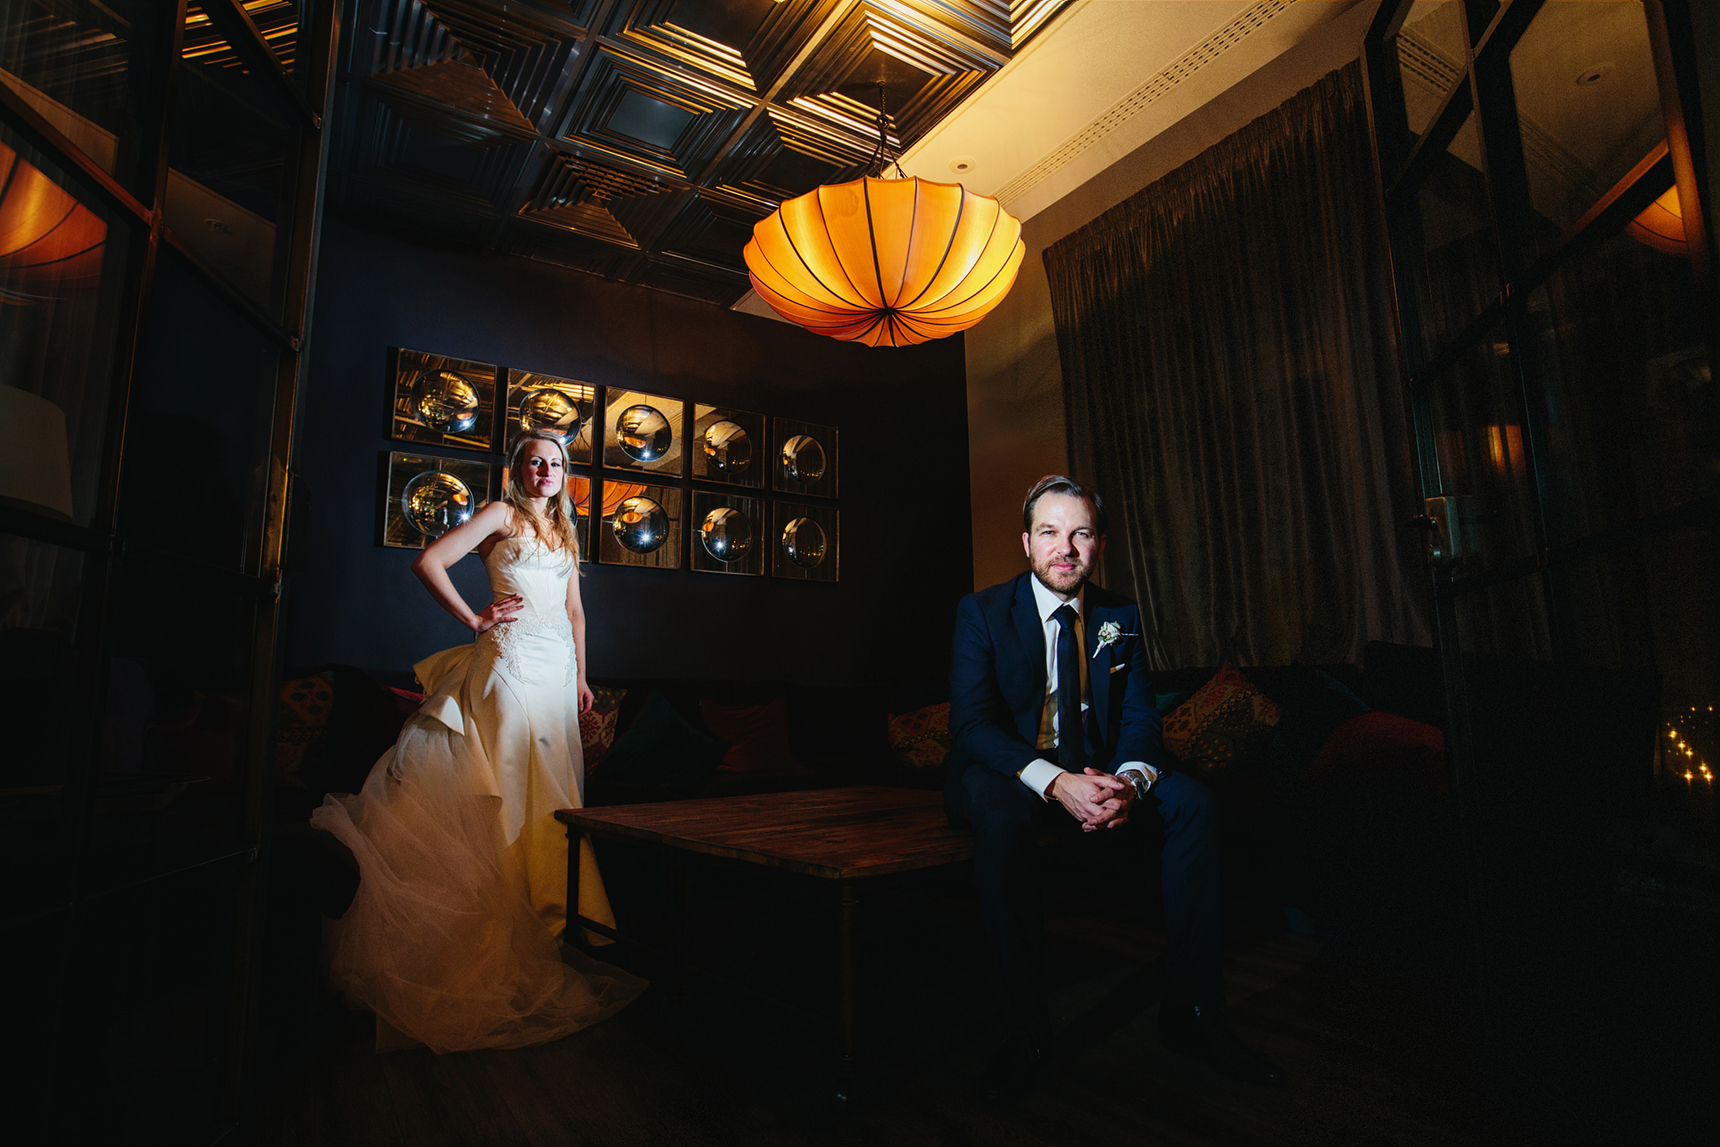 On the 7th wedding photographer